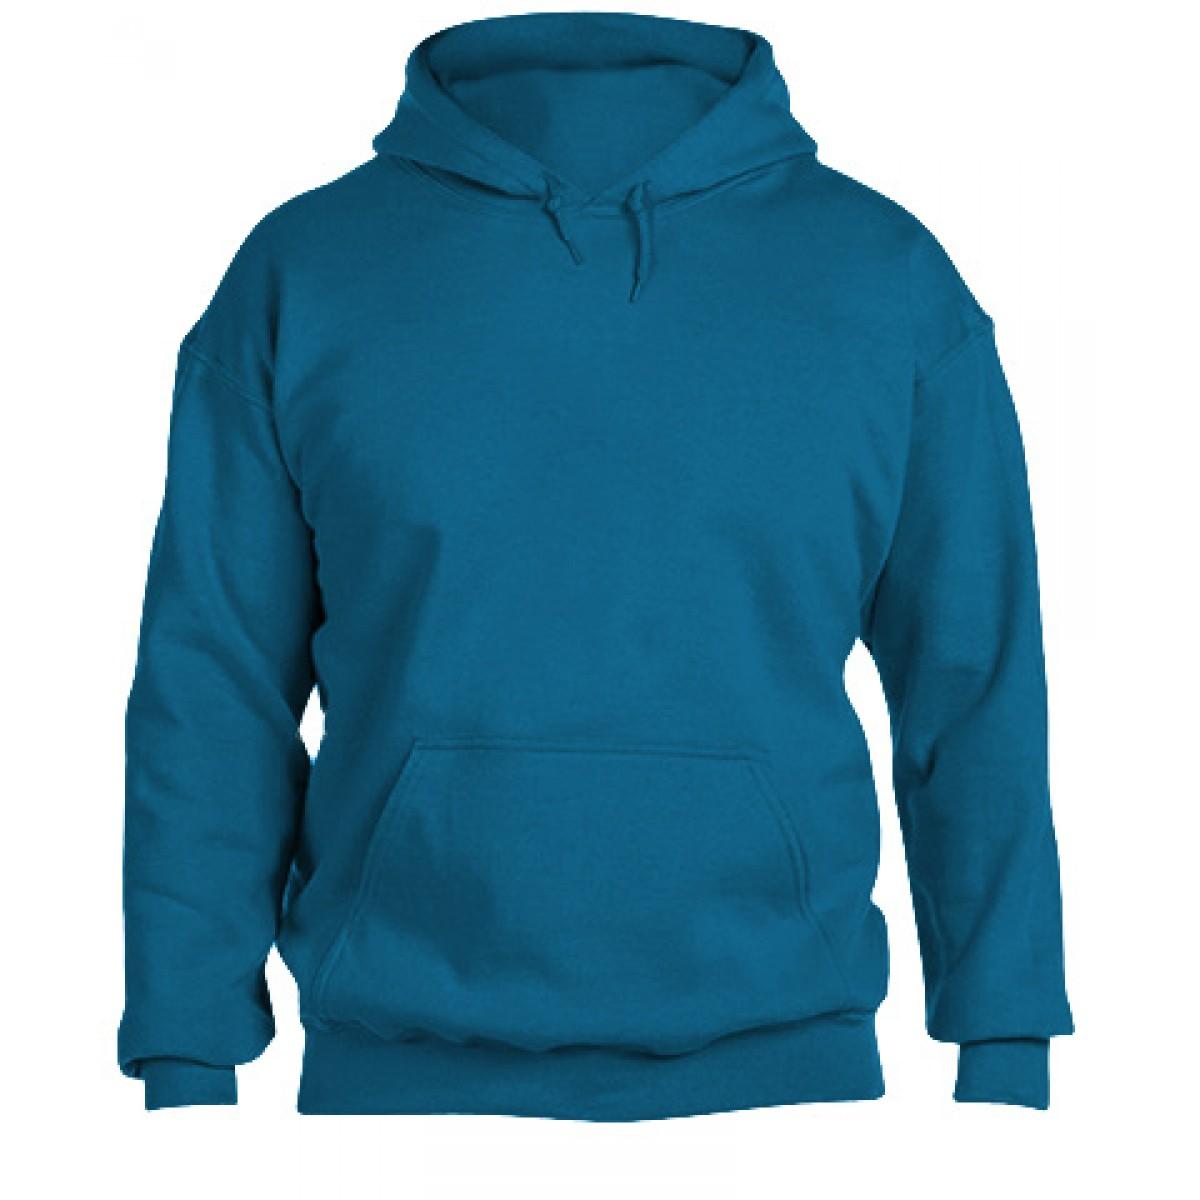 Hooded Sweatshirt 50/50 Heavy Blend -Sapphire-M